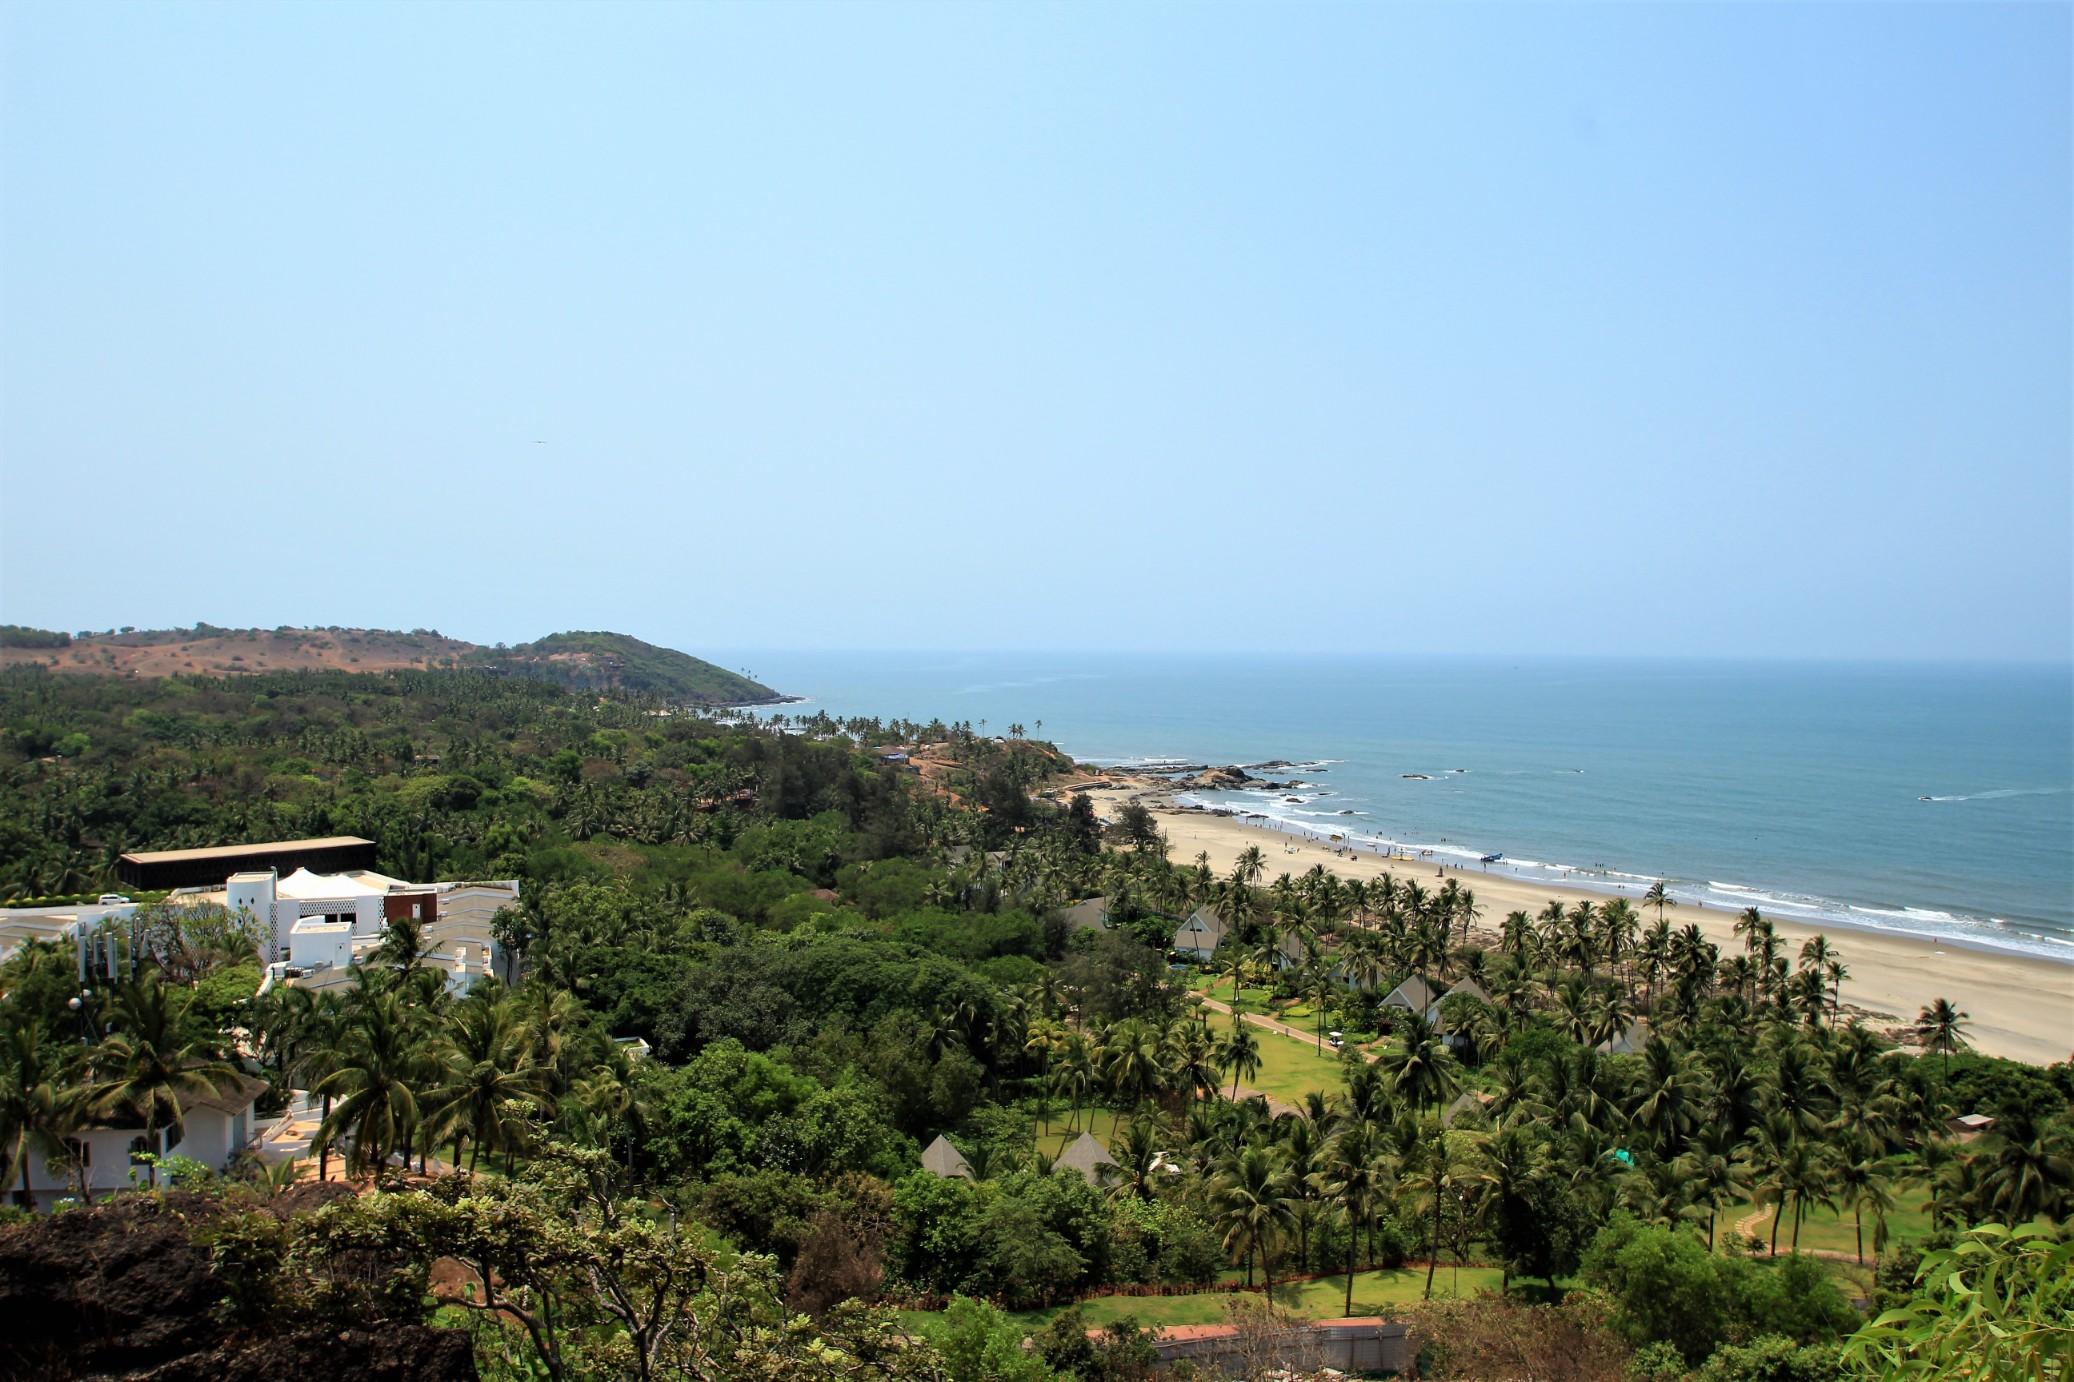 Overlooking the W Resort on Vagator